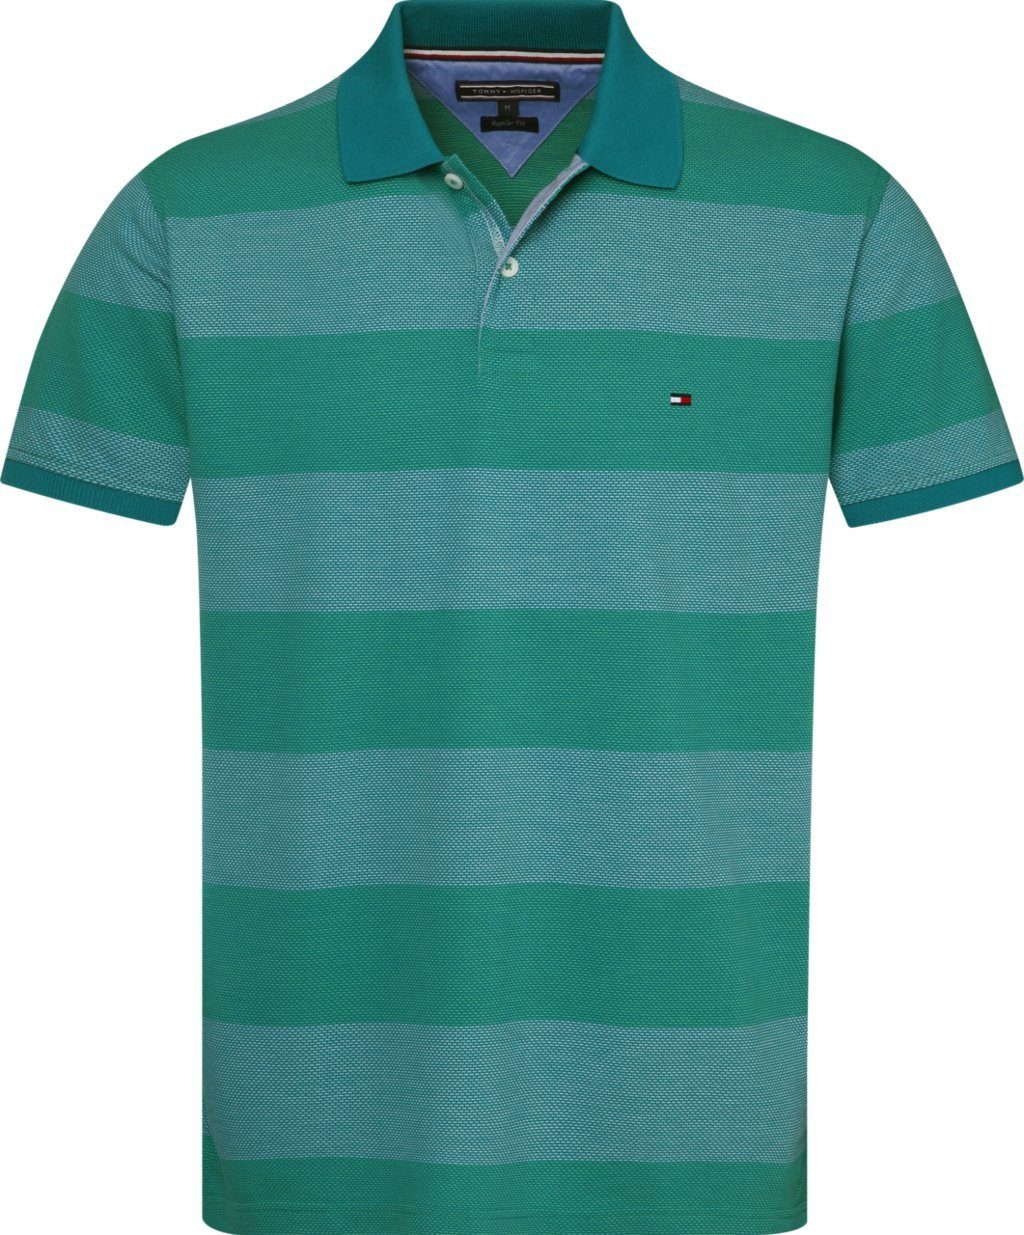 Tommy Hilfiger Poloshirt »JACQUARD STRUCTURE STRIPE POLO«